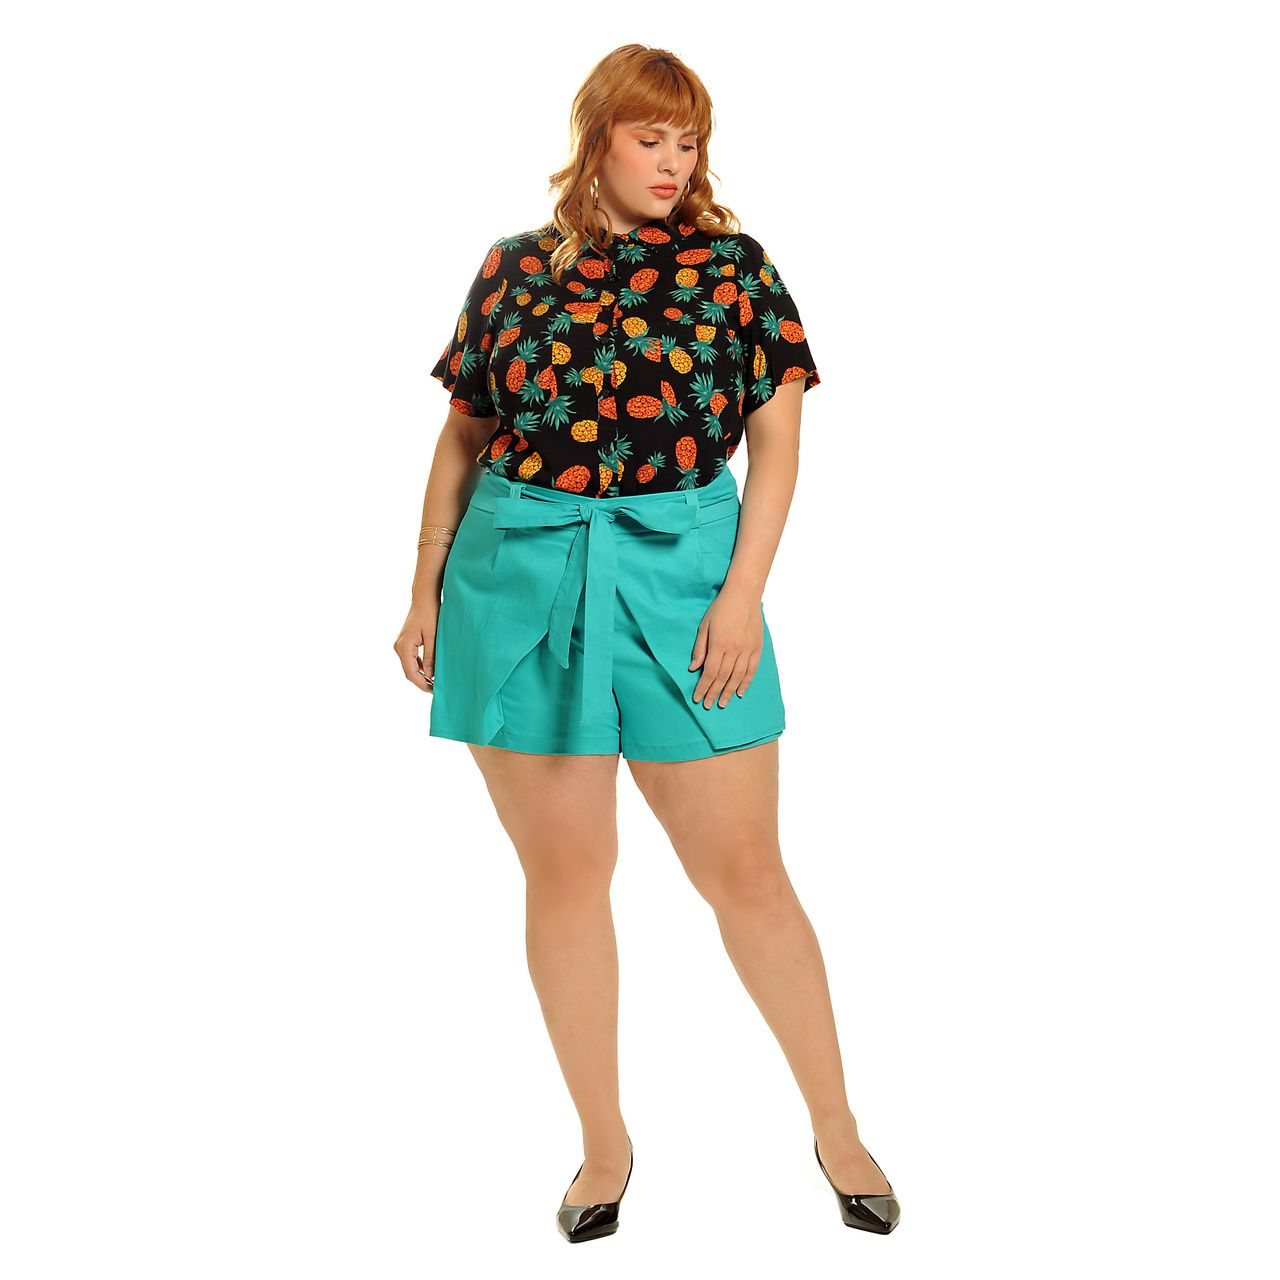 Short saia alfaiataria turquesa plus size